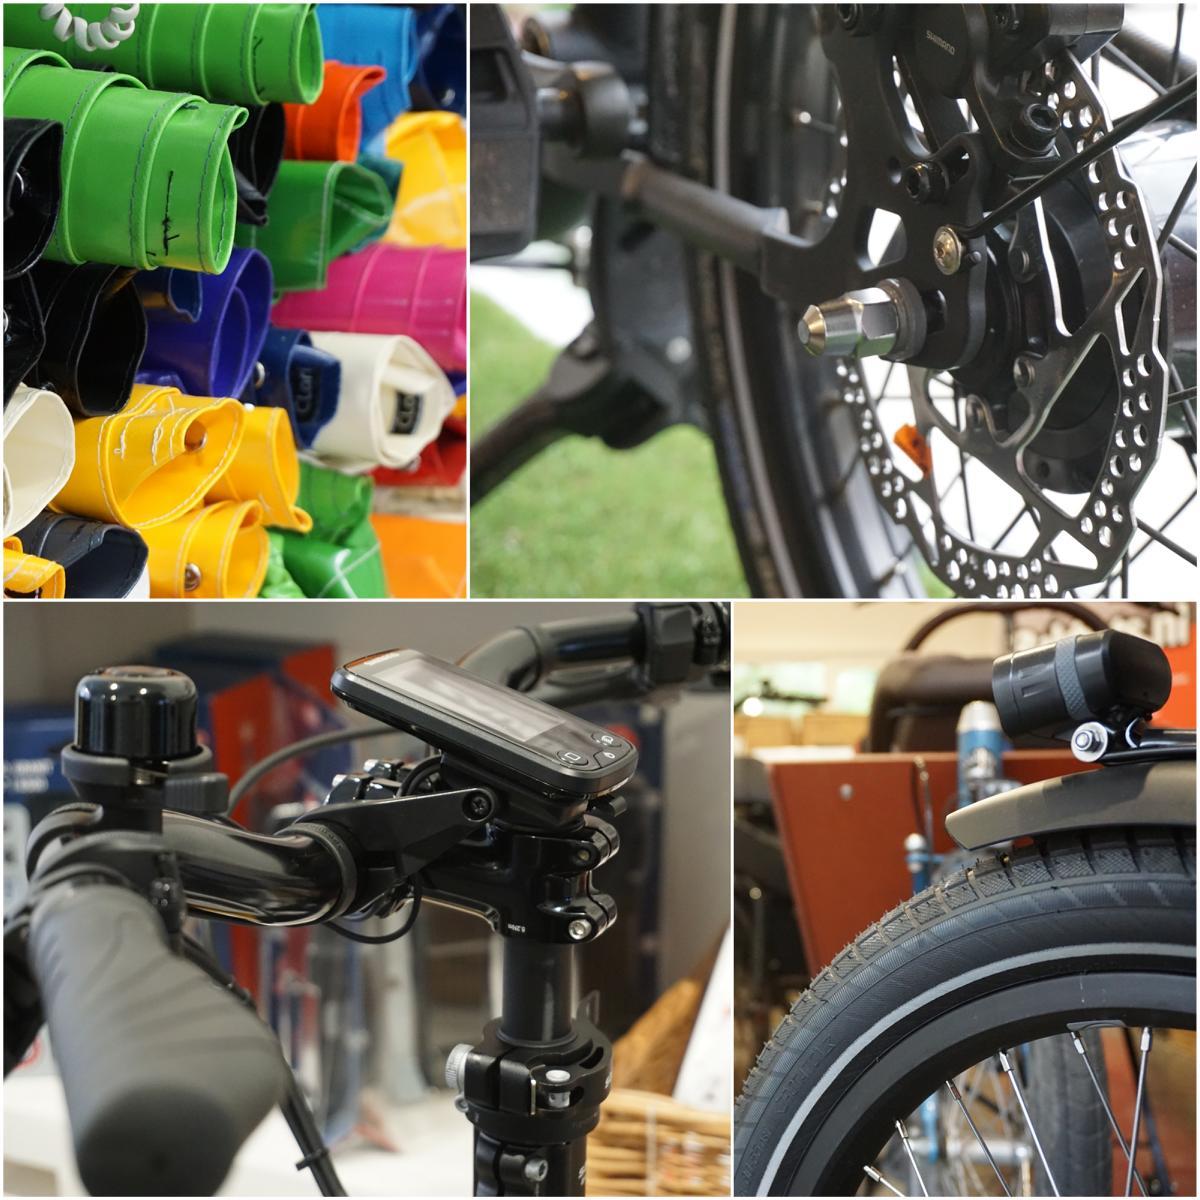 style hannover velogold 7 - VELOGOLD cargobikes = Lastenfahrräder